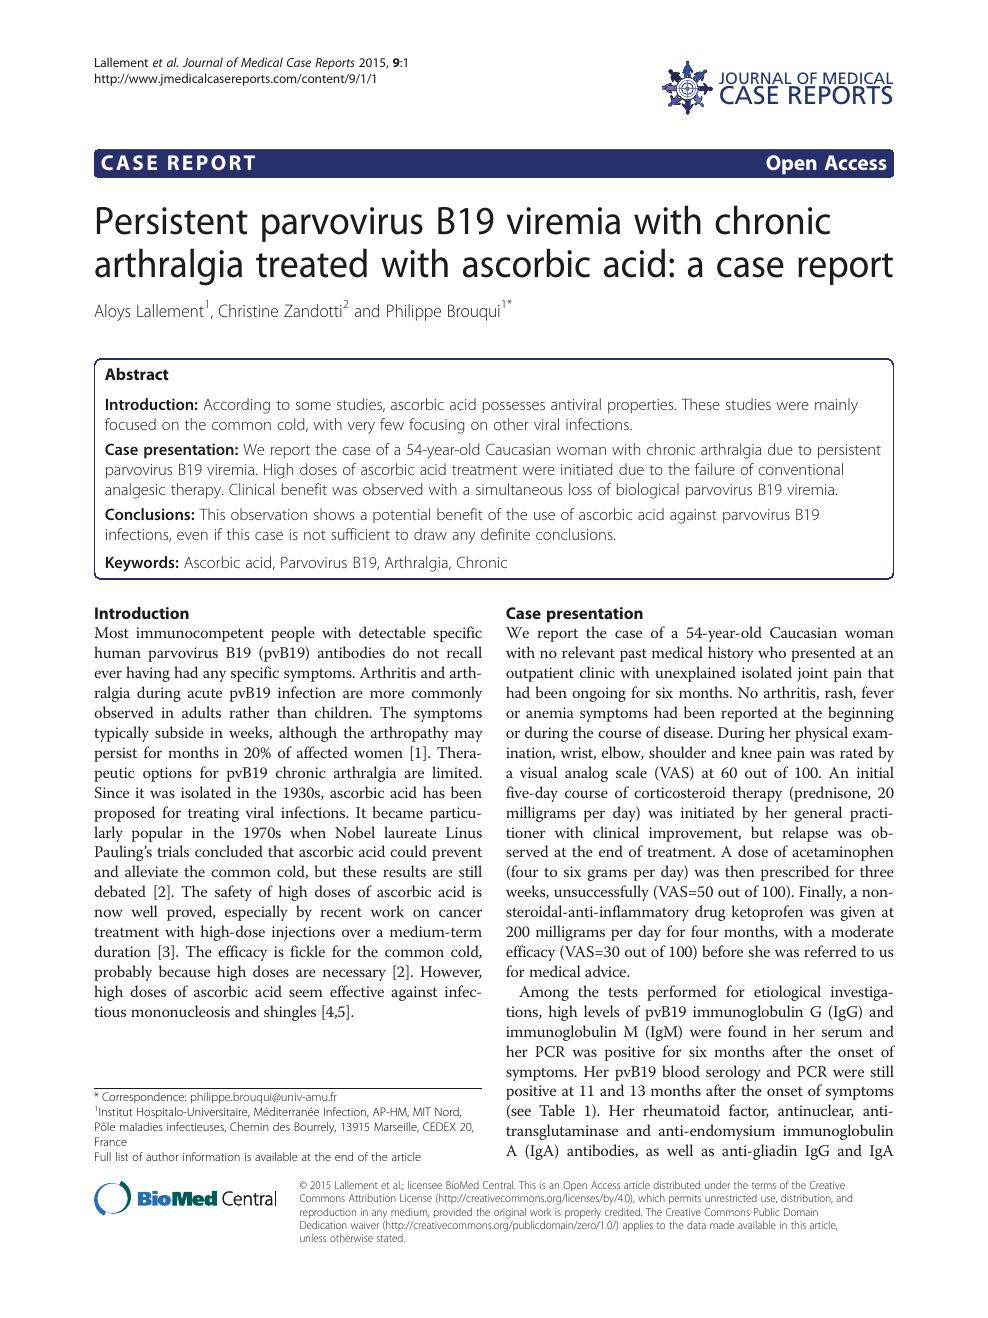 Persistent Parvovirus B19 Viremia With Chronic Arthralgia Treated